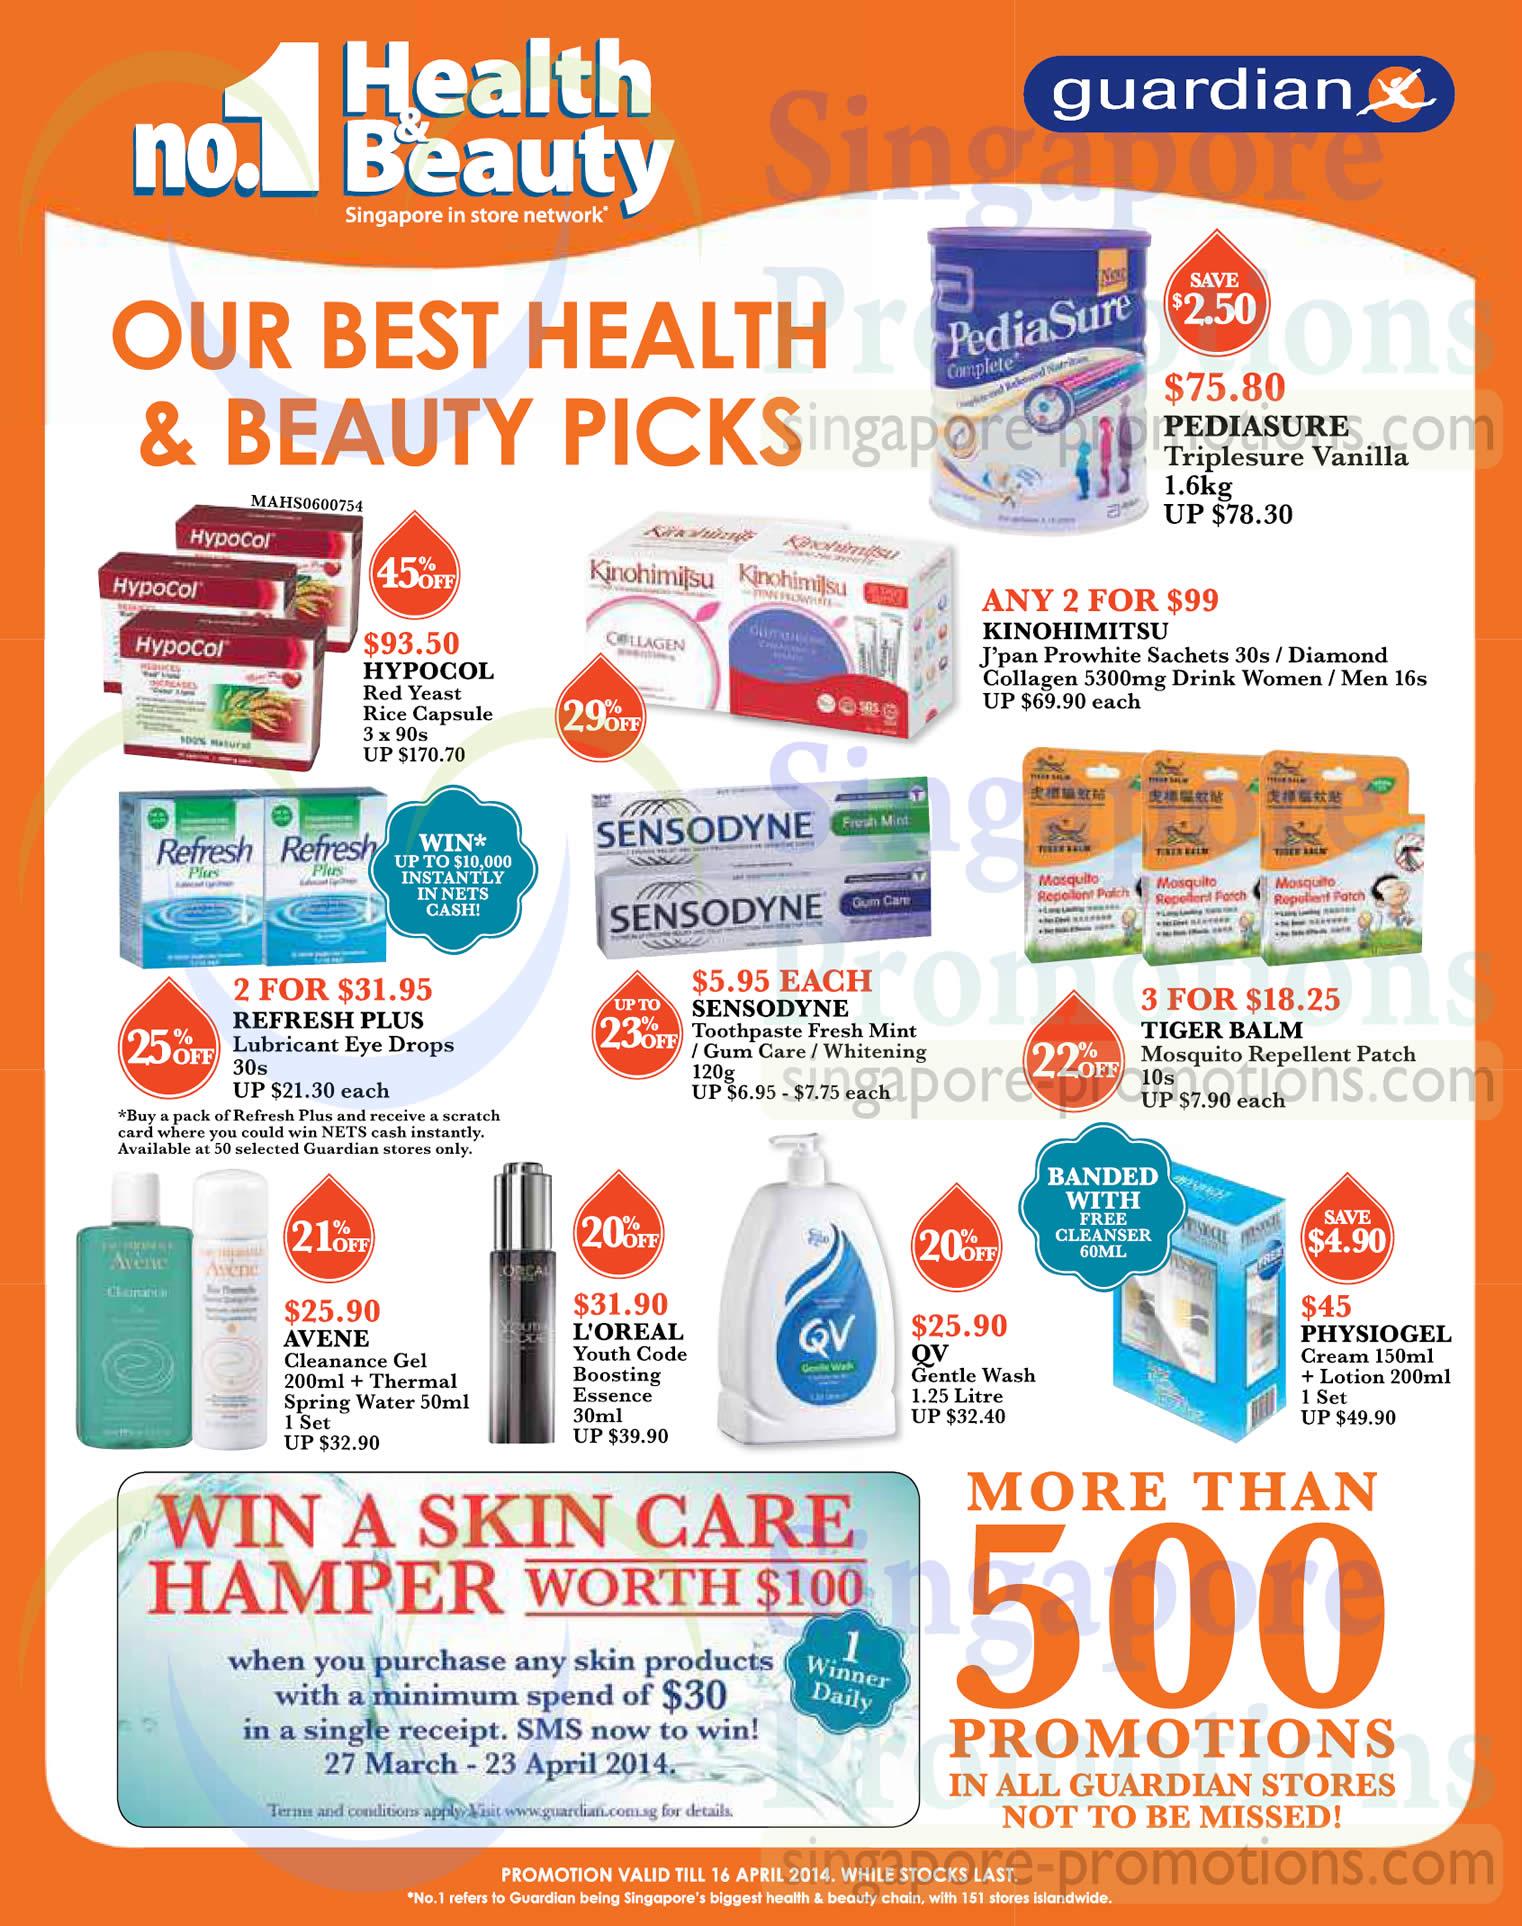 Health n Beauty Picks Pediasure, Hypocol, Sensodyne, Loreal, QV, Physiogel, Avene